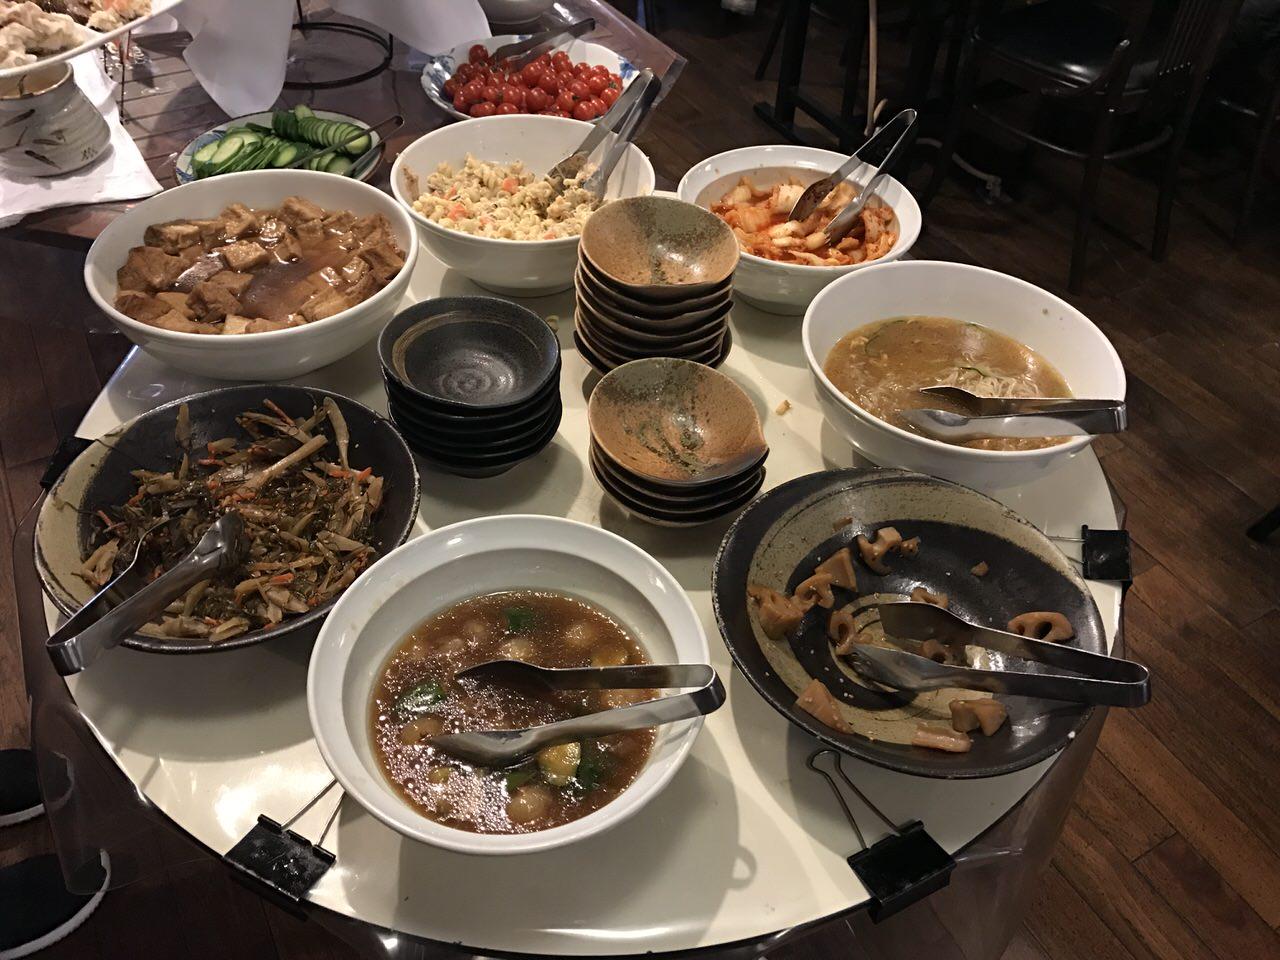 Butagumi lunch 3379